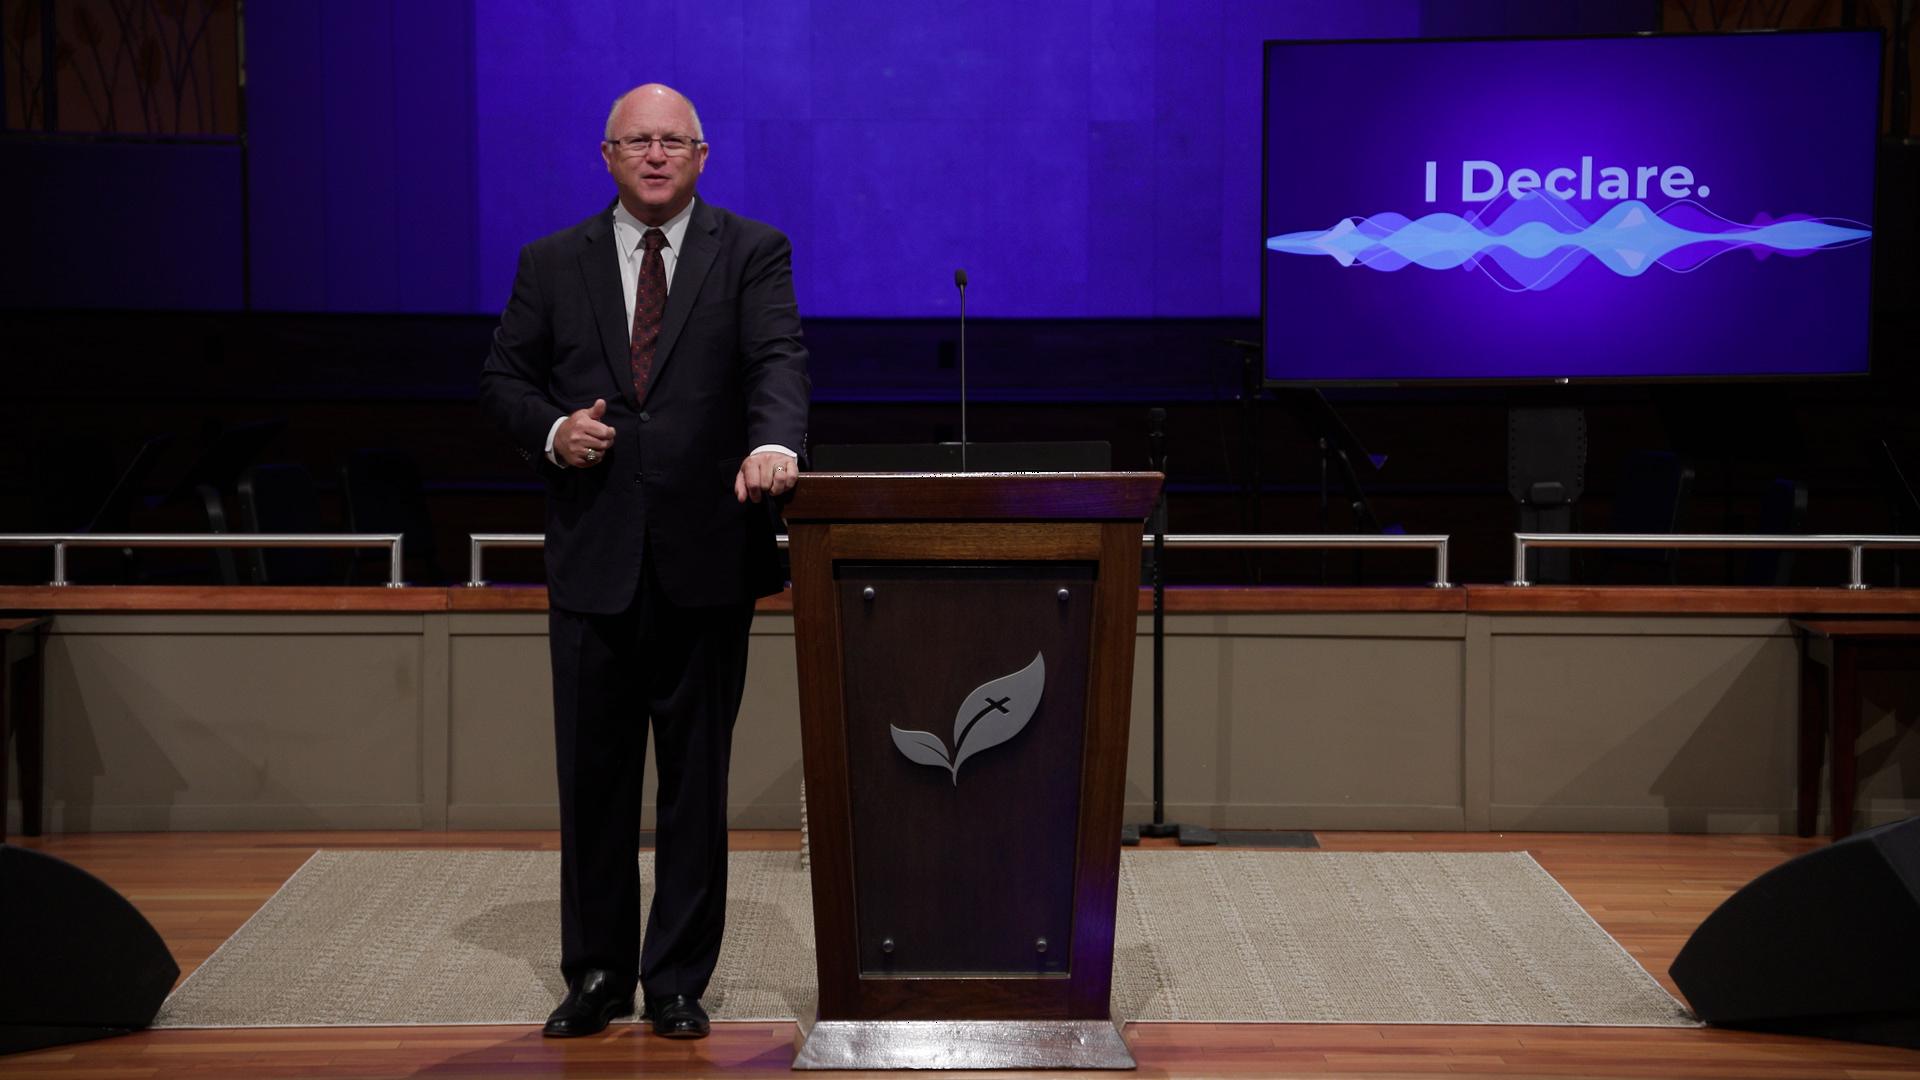 Pastor Paul Chappell: Paul's Declaration of the Gospel